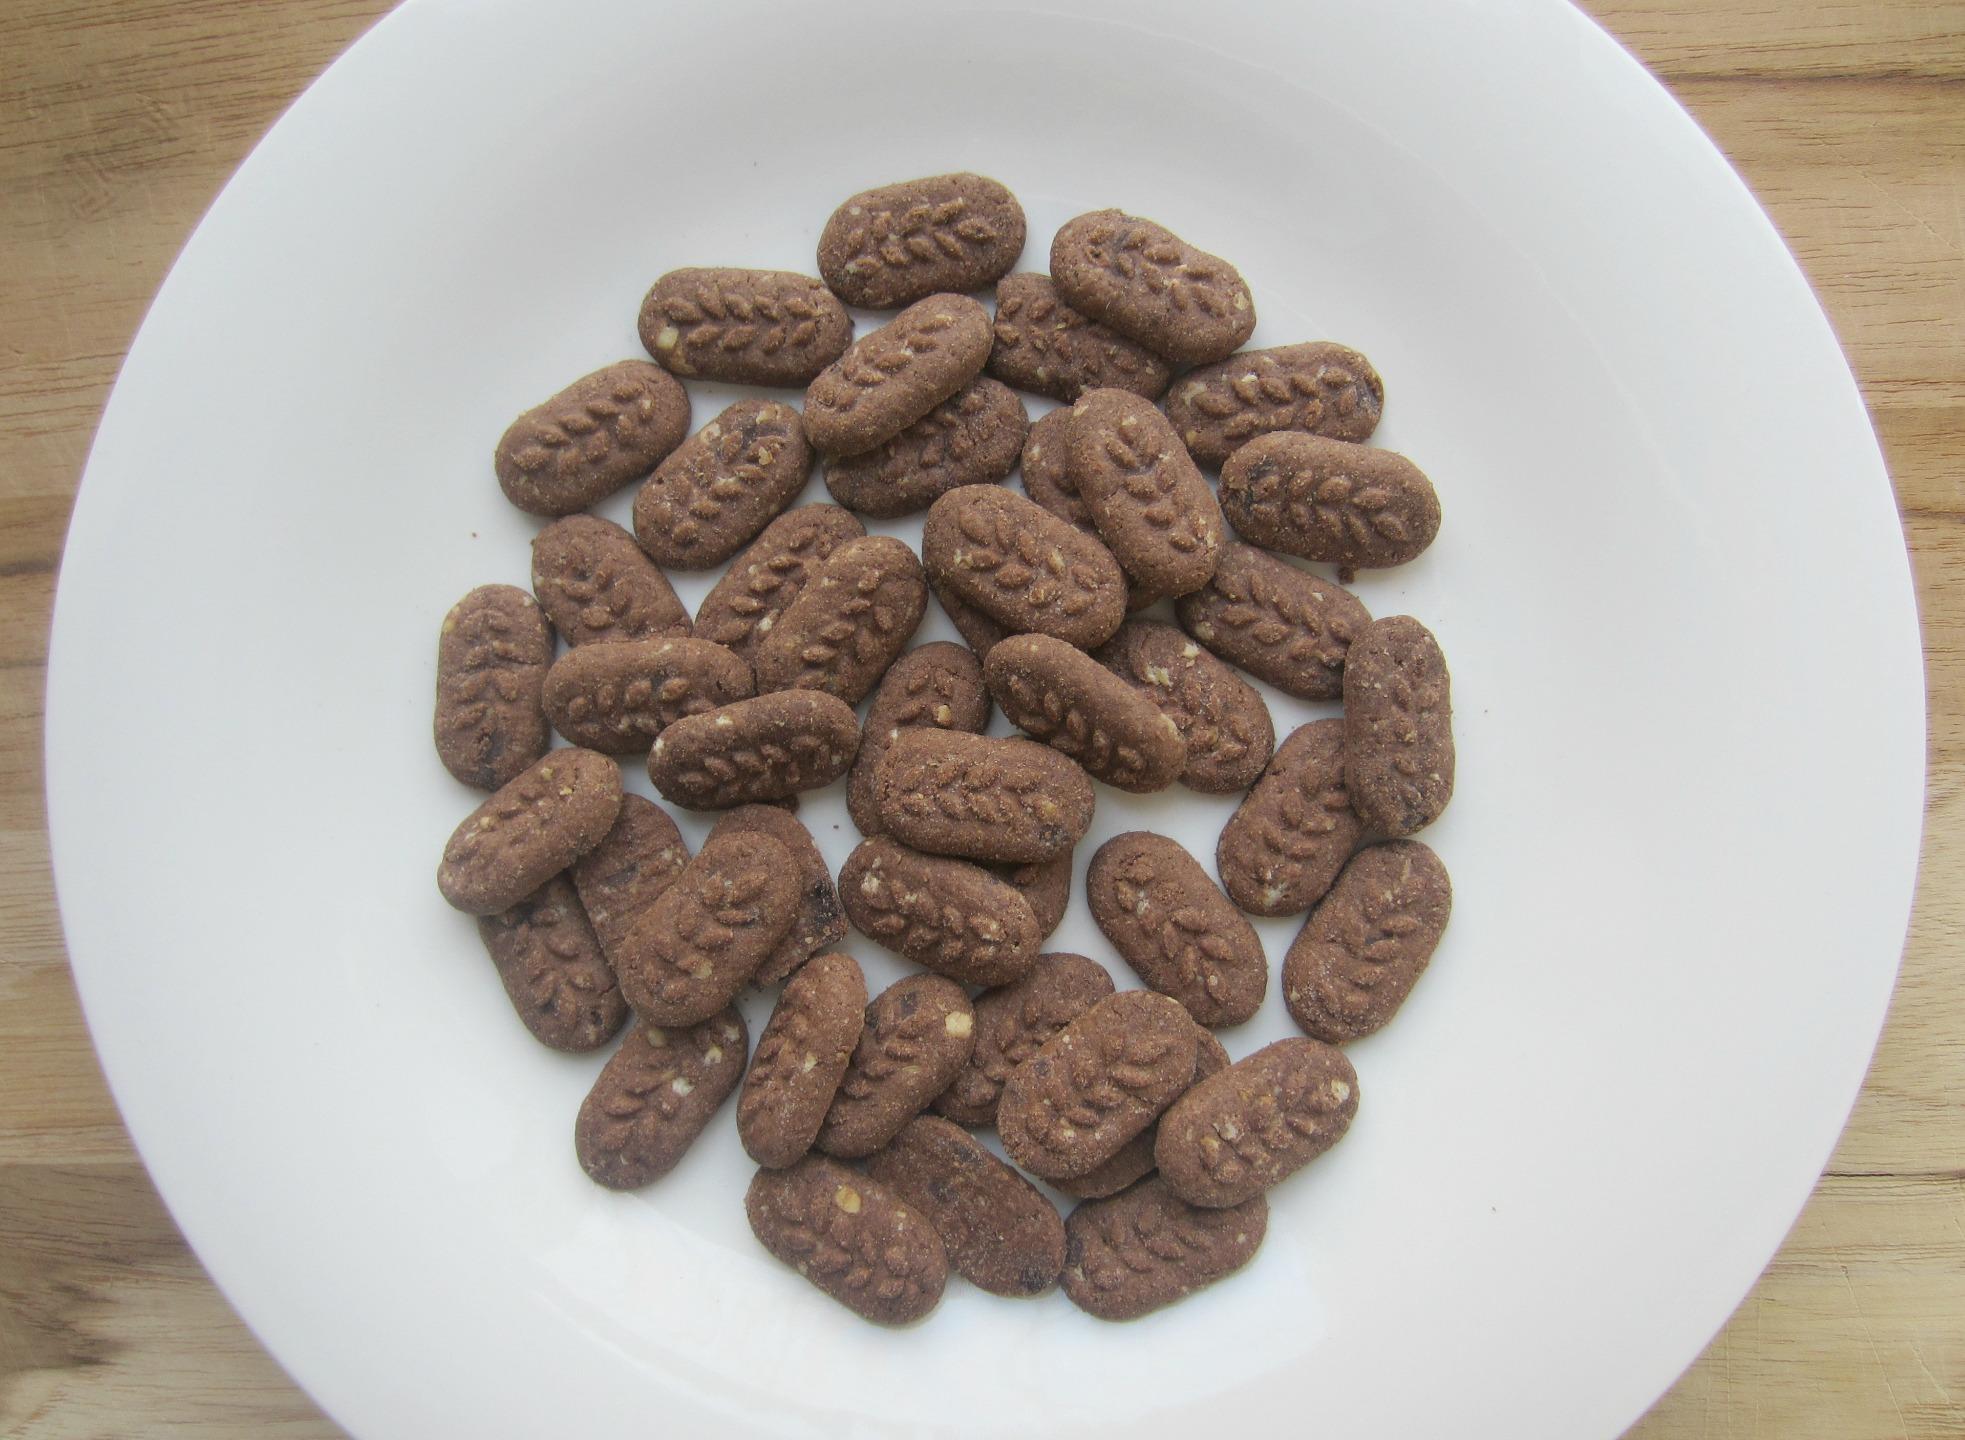 belvita bites chocolate